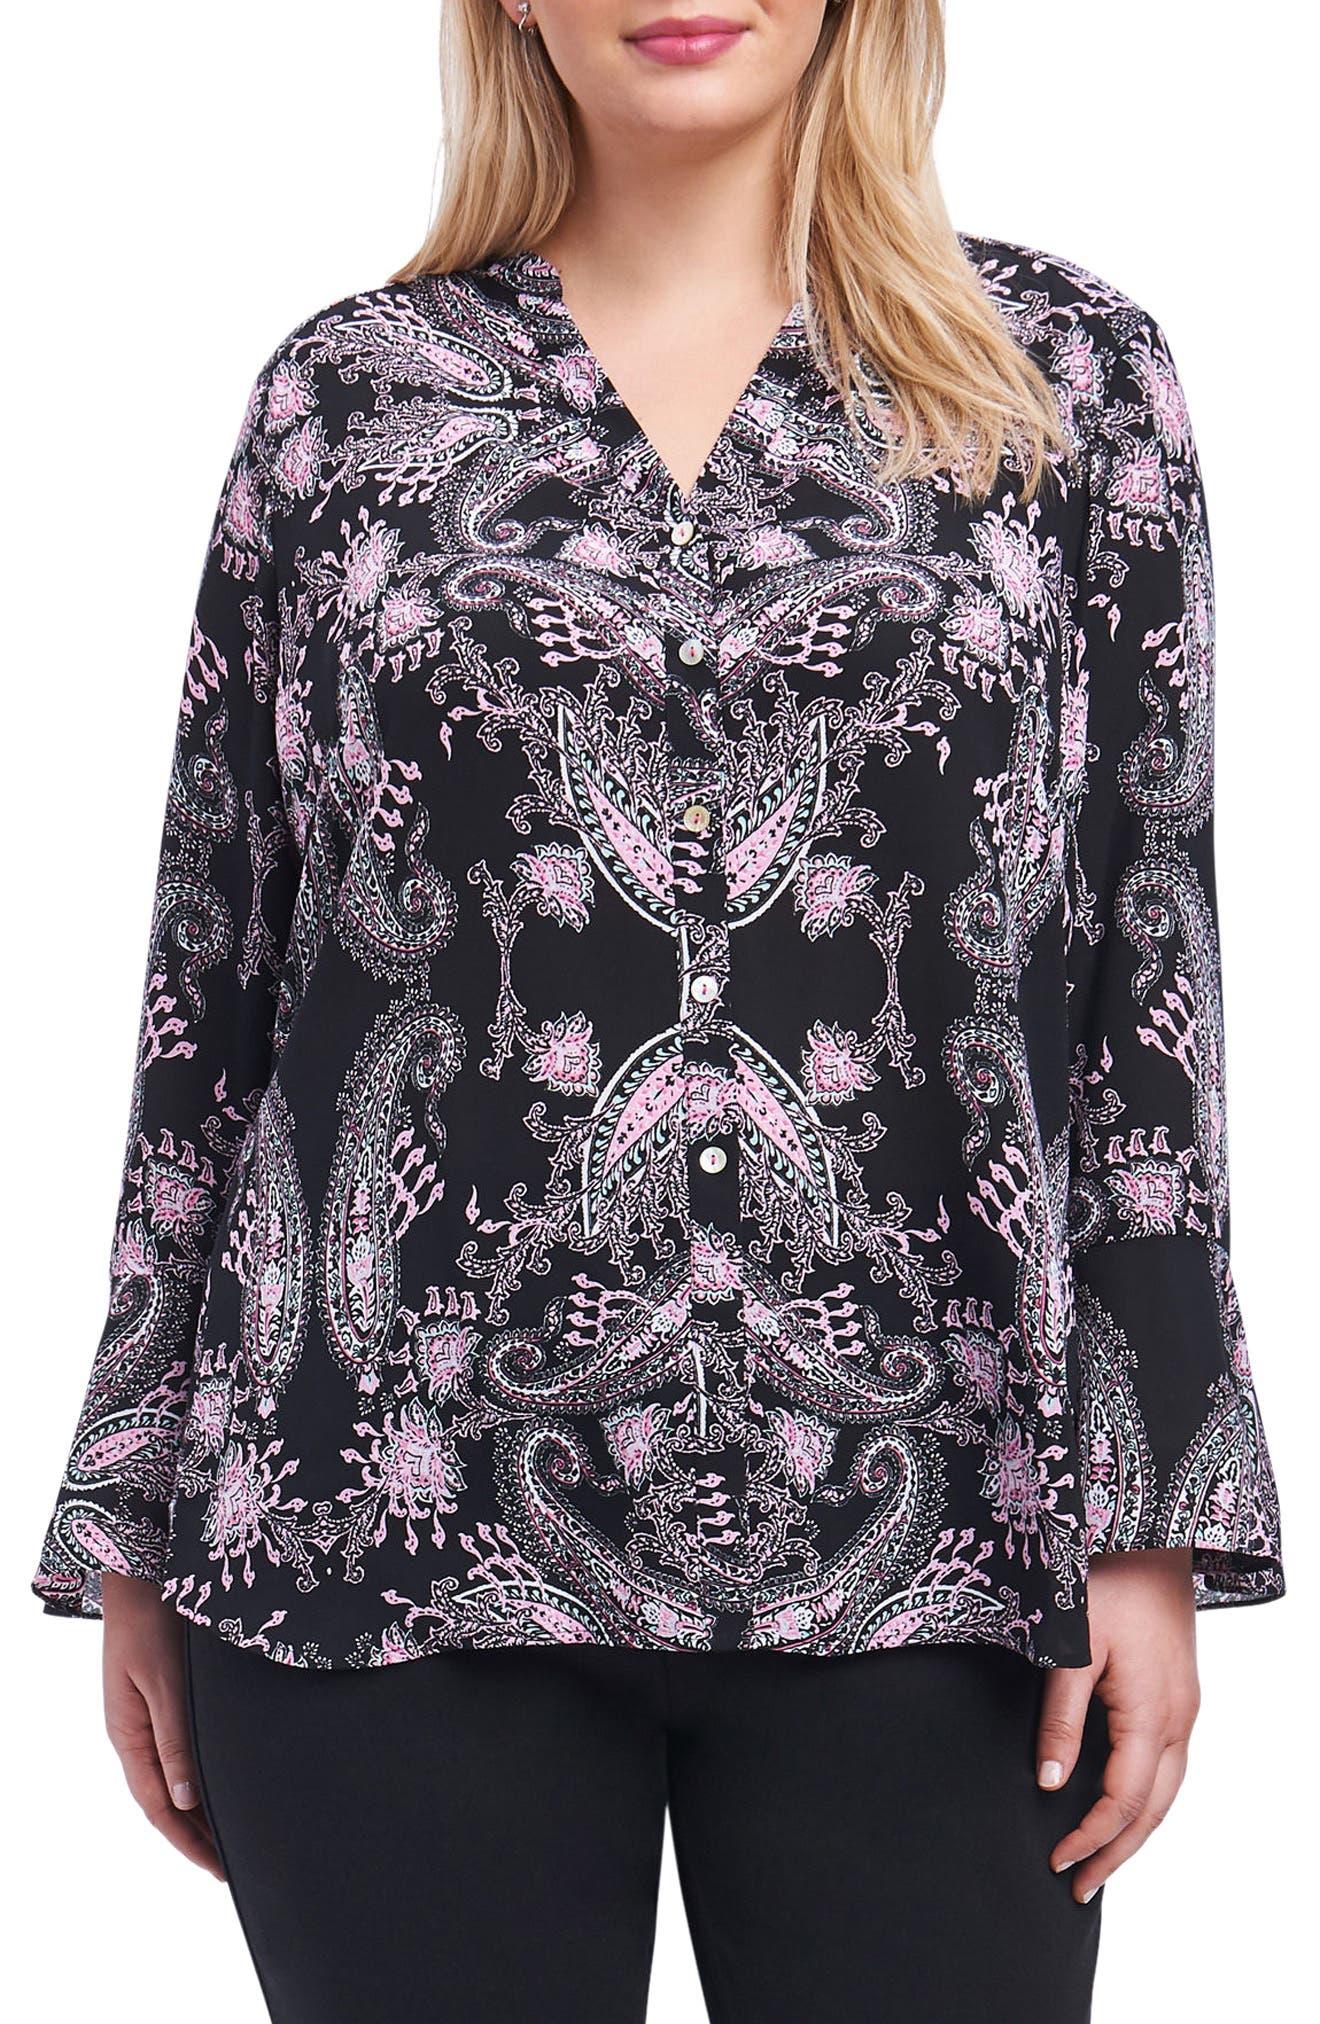 Main Image - Foxcroft Ali Dolce Vita Bell Sleeve Shirt (Plus Size)